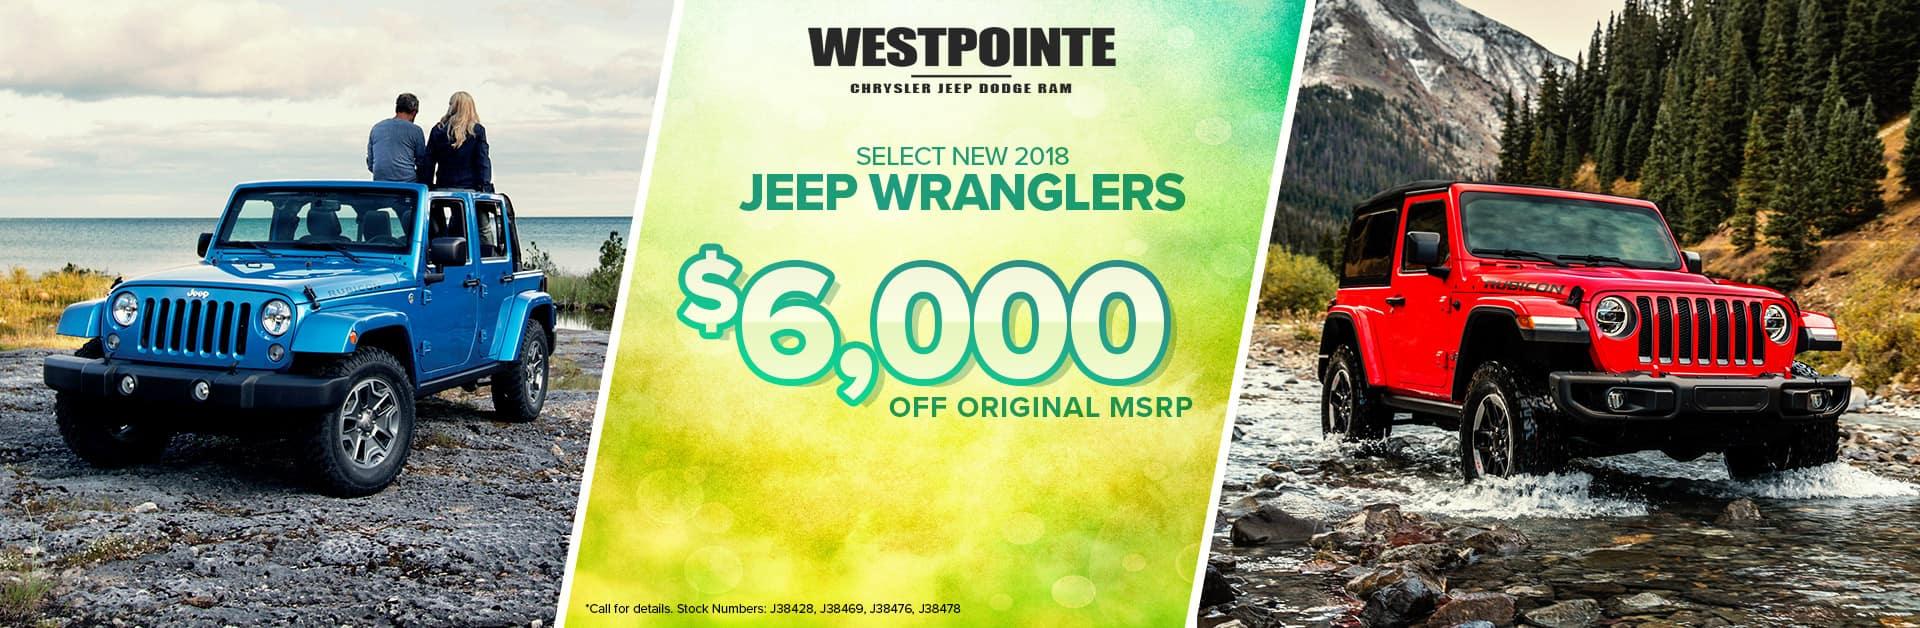 2018 Jeep Wrangler - Westpointe Chrysler Jeep Dodge Ram